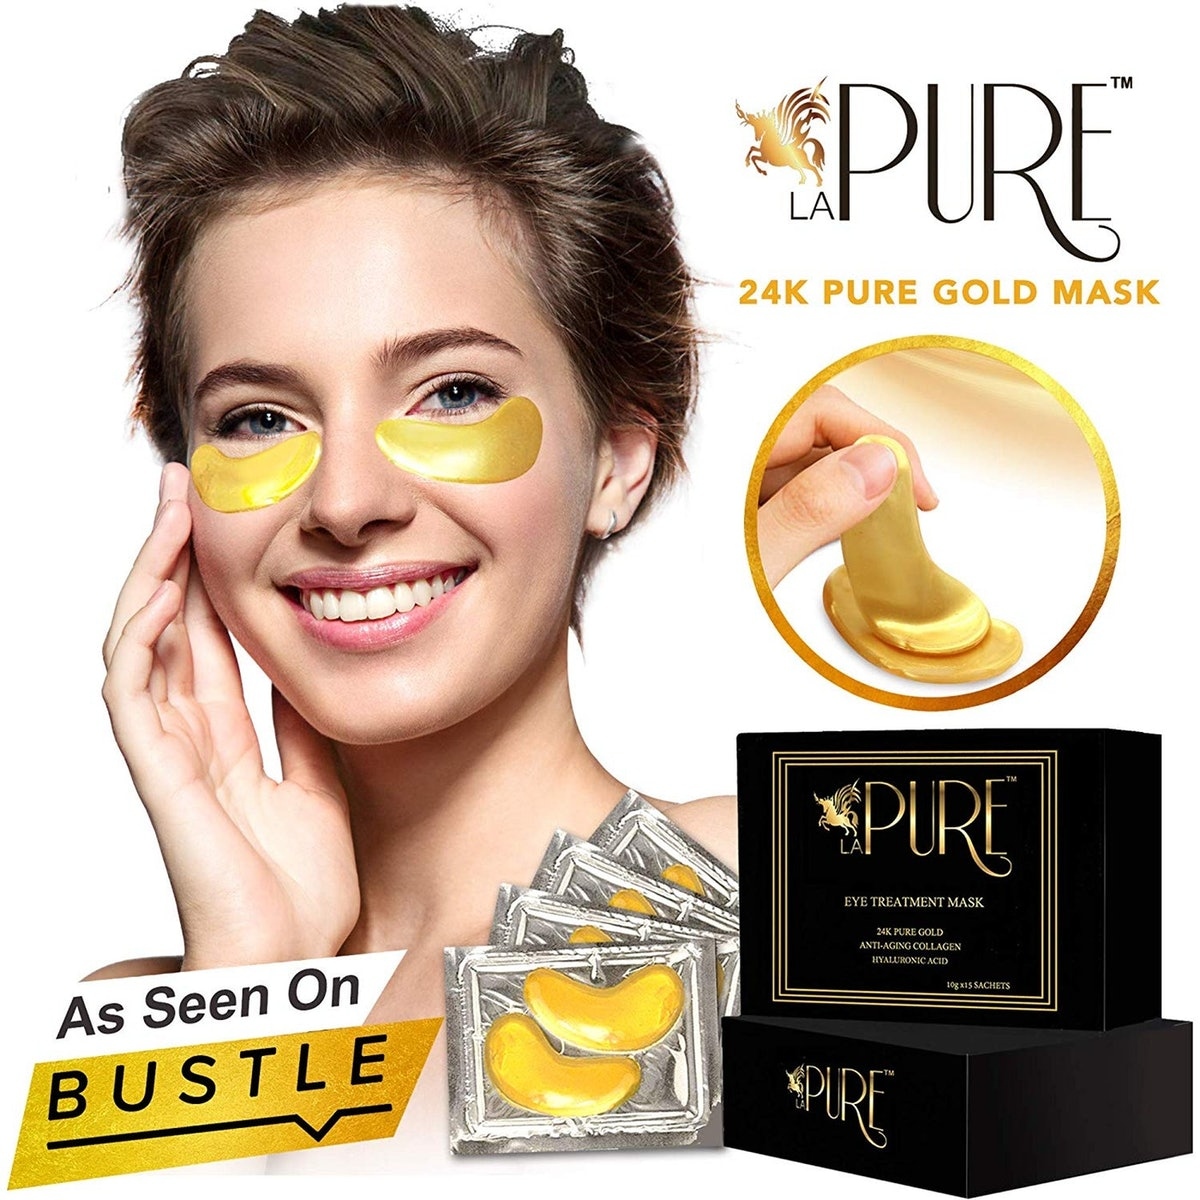 LA PURE 24K Gold Eye Treatment Masks (15 Pairs)